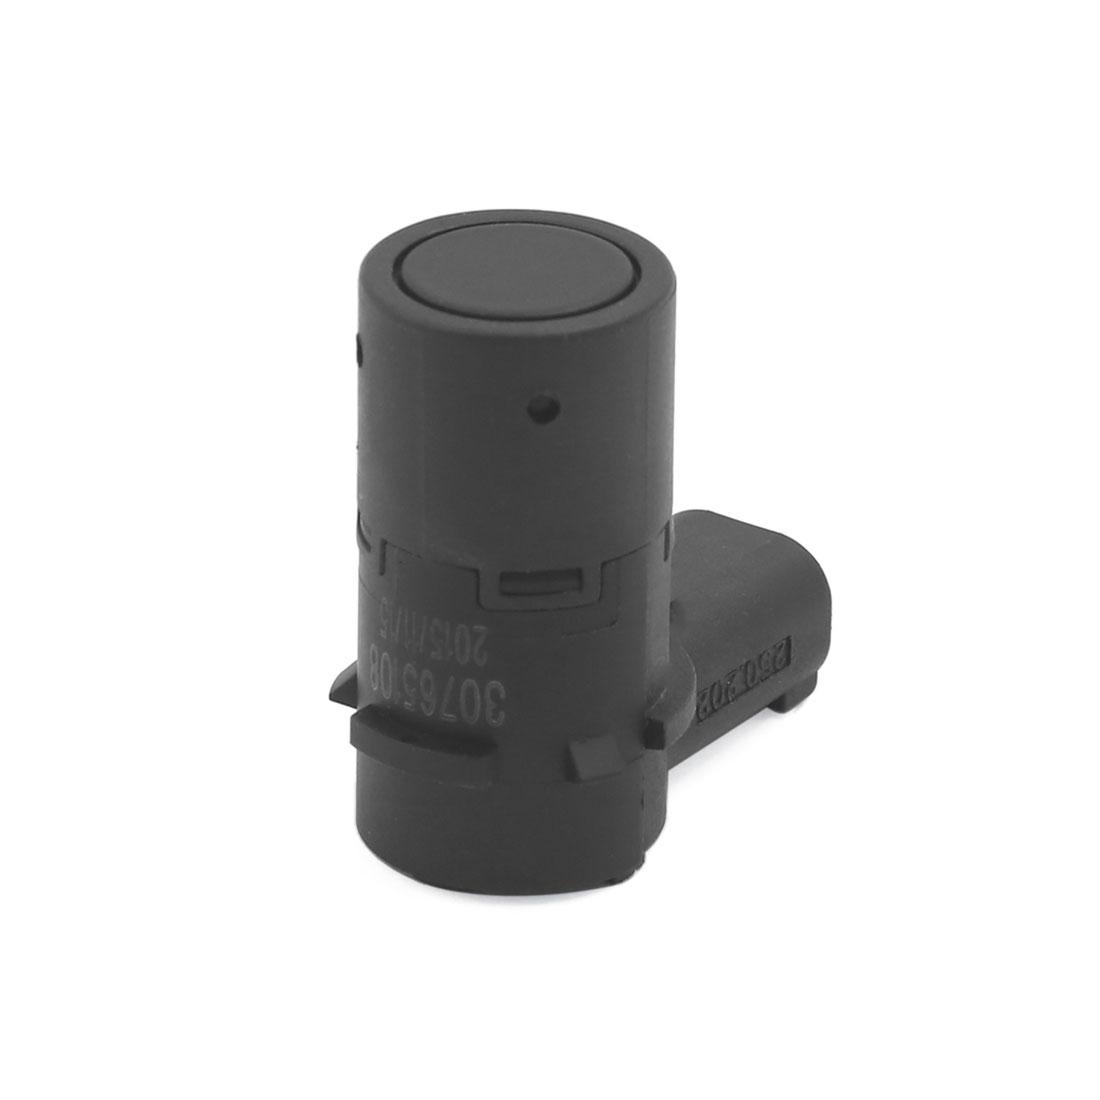 PDC Parking Assist Sensor for VOLVO C70 S40 S60 S80 V50 V70 V70X XC90 30765108